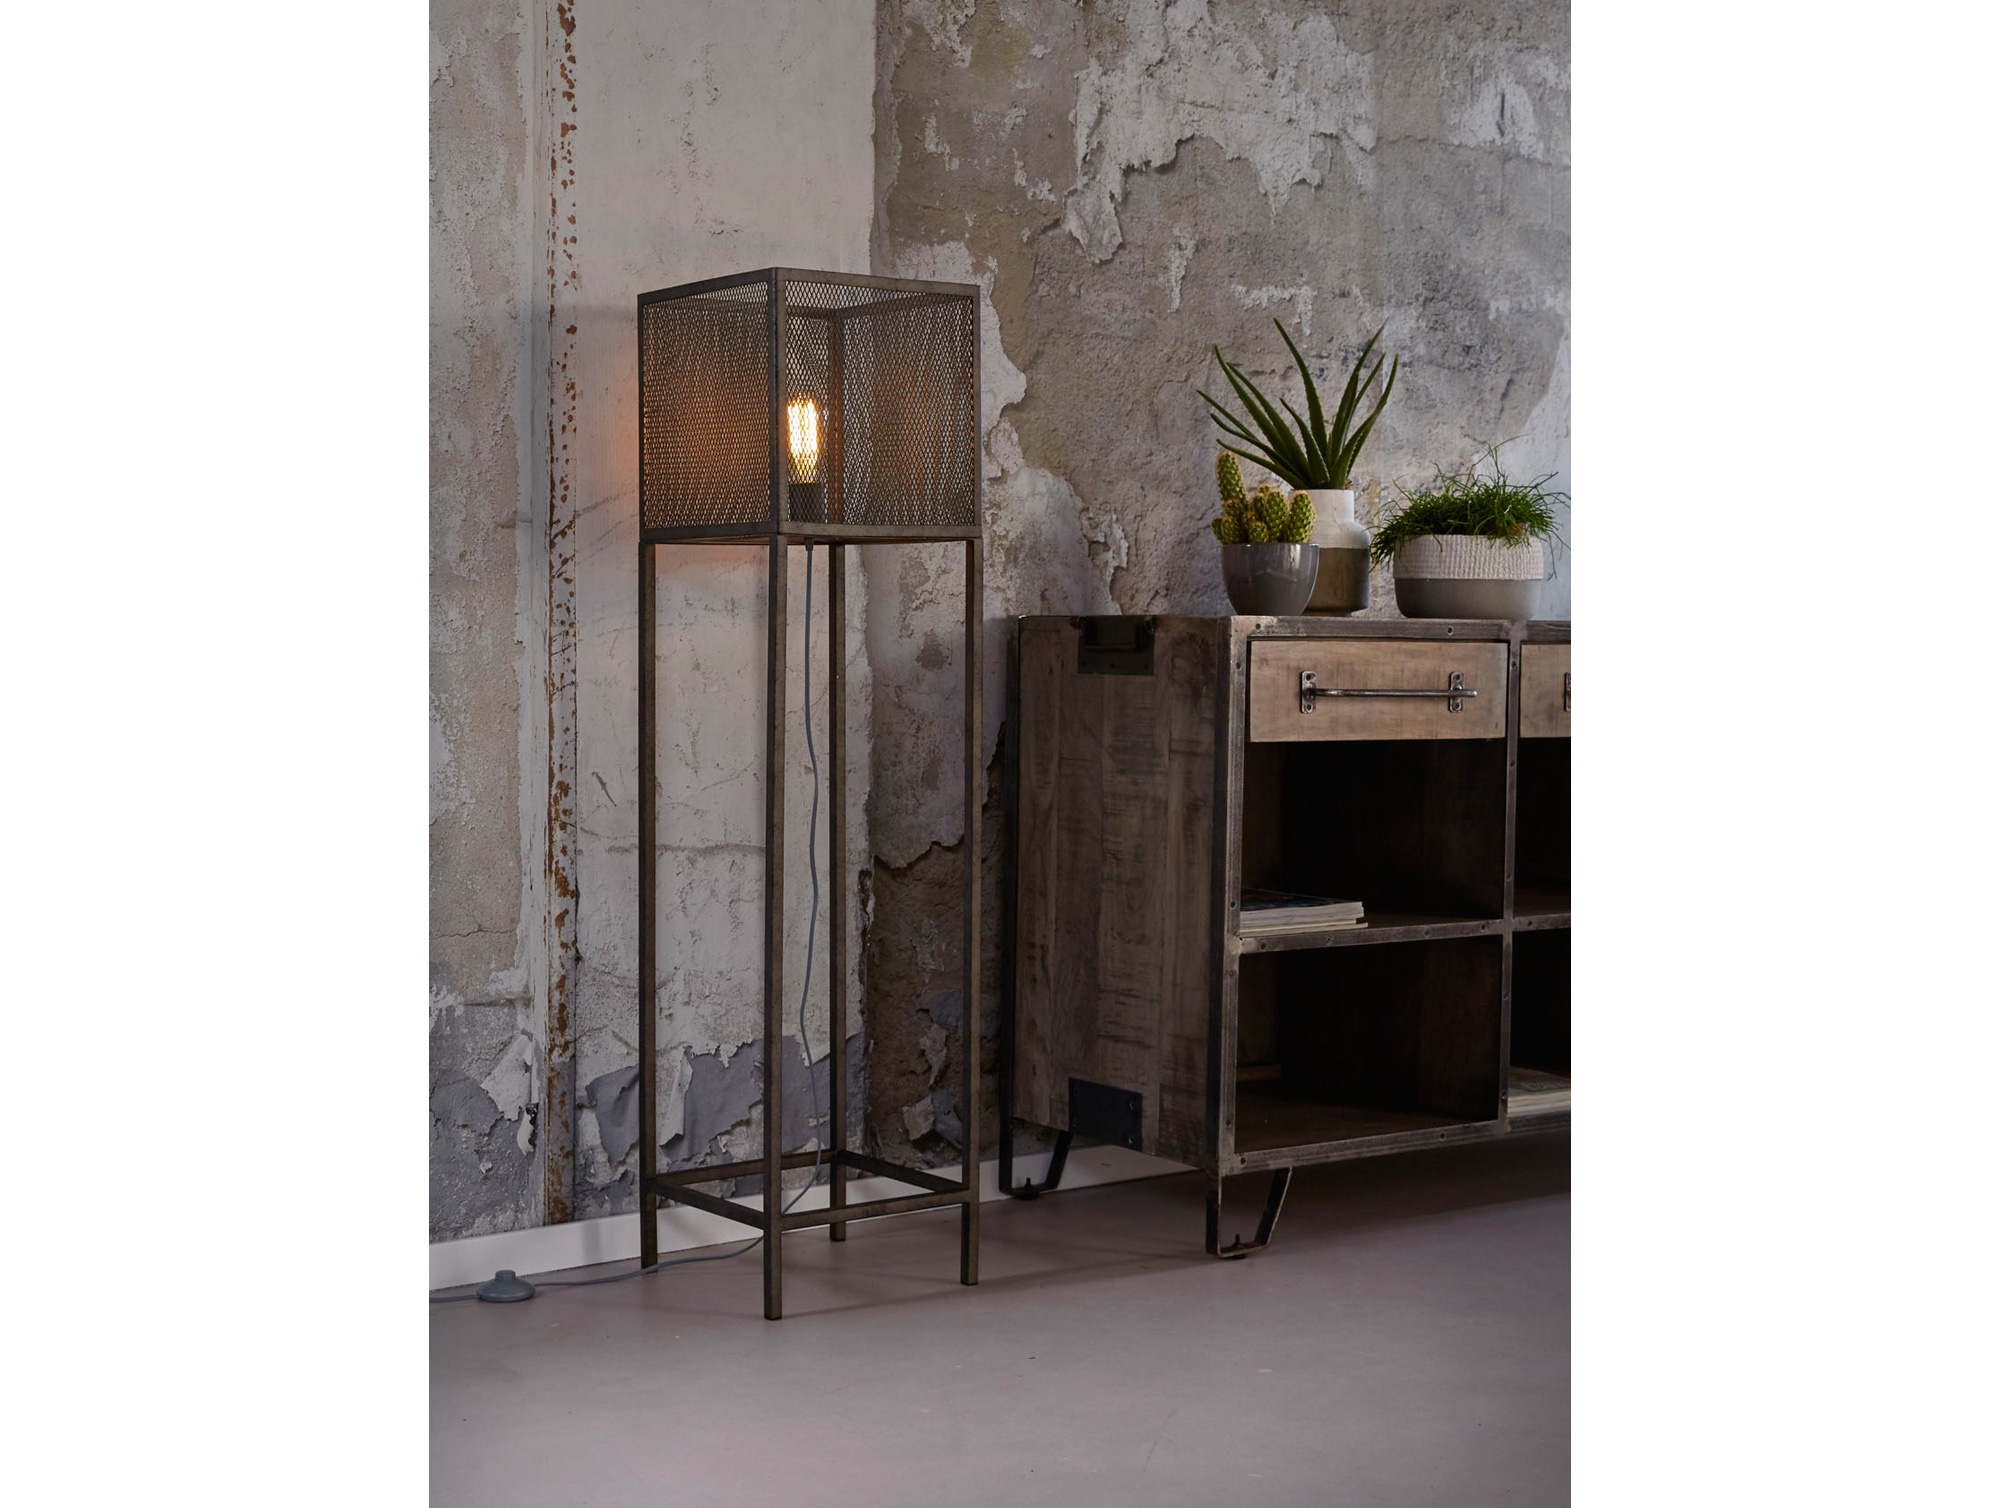 stehlampe metall relaxdays stehlampe gelenk galando vintage design hxbxt x x cm stehlampe. Black Bedroom Furniture Sets. Home Design Ideas